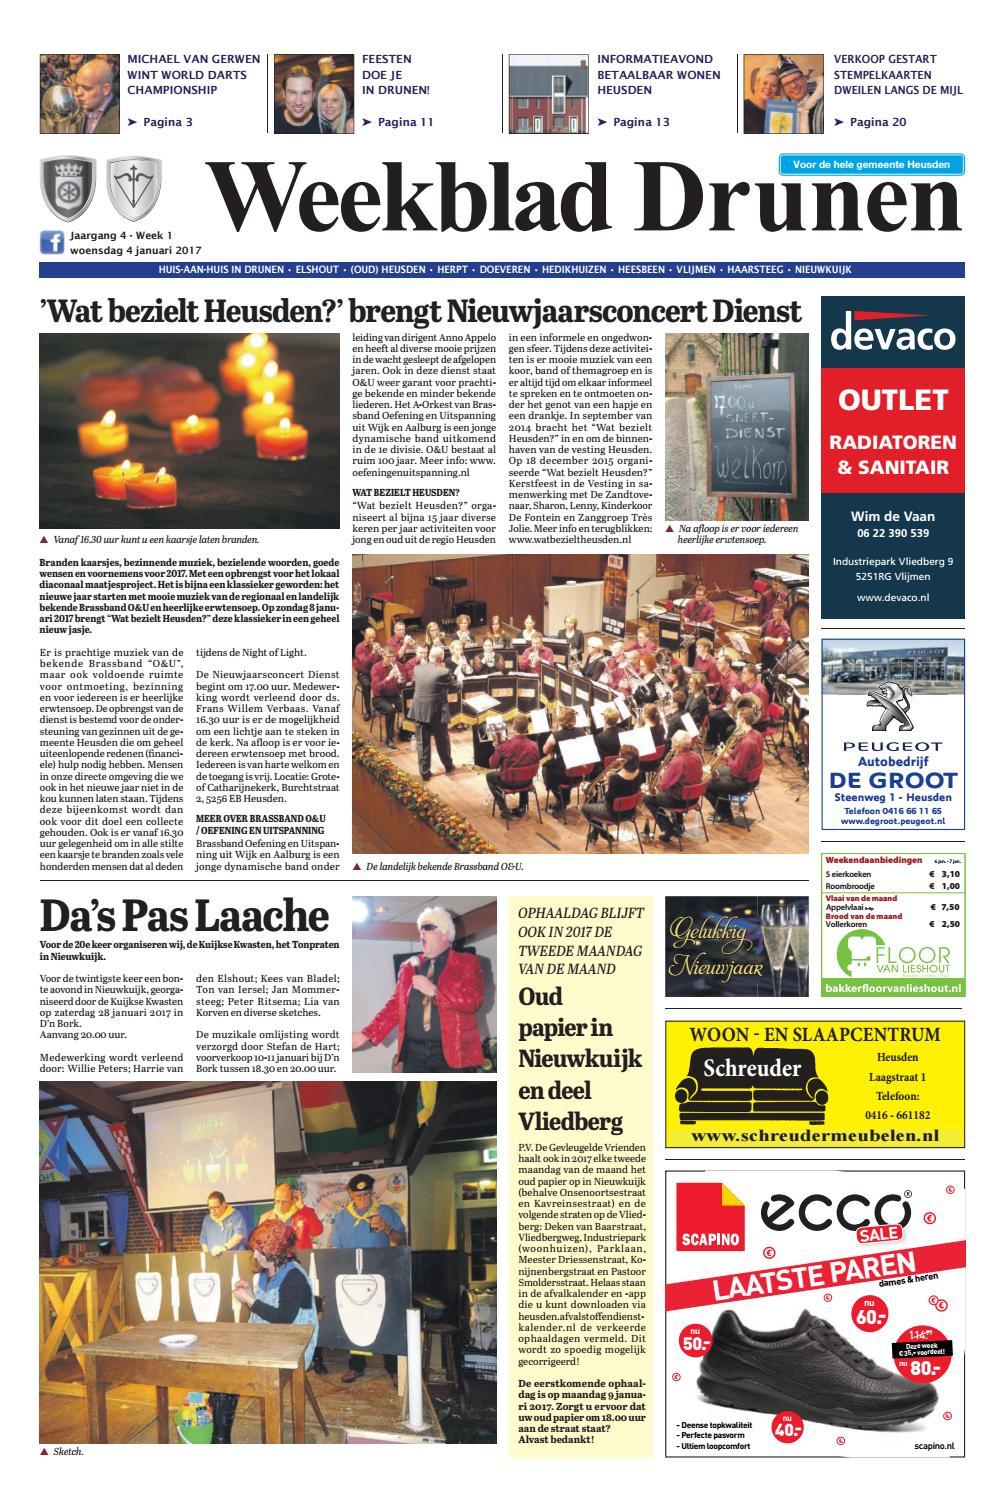 Loodveter 50 Gram.Weekblad Drunen 04 01 2017 By Uitgeverij Em De Jong Issuu